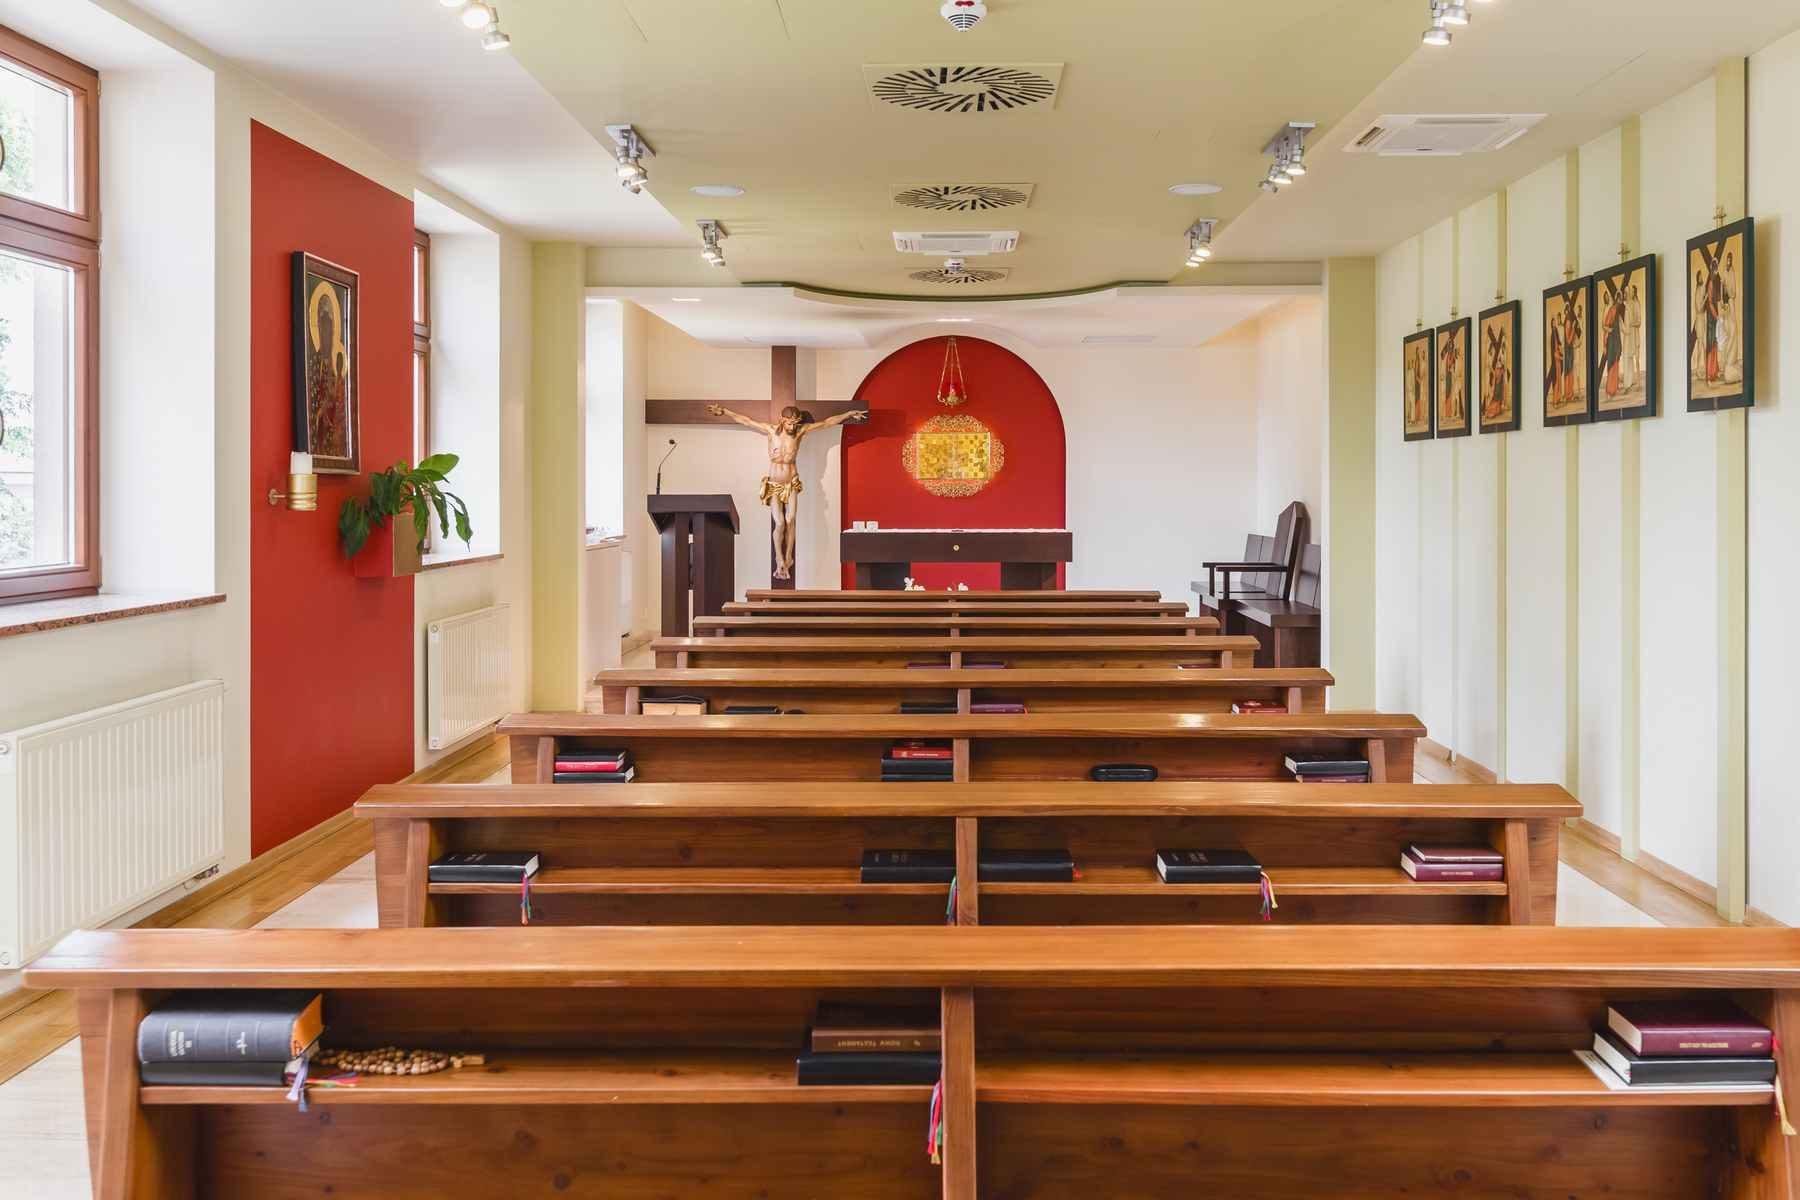 Kaplica, rekolekcje, rekolekcje kapłańskie, chapel